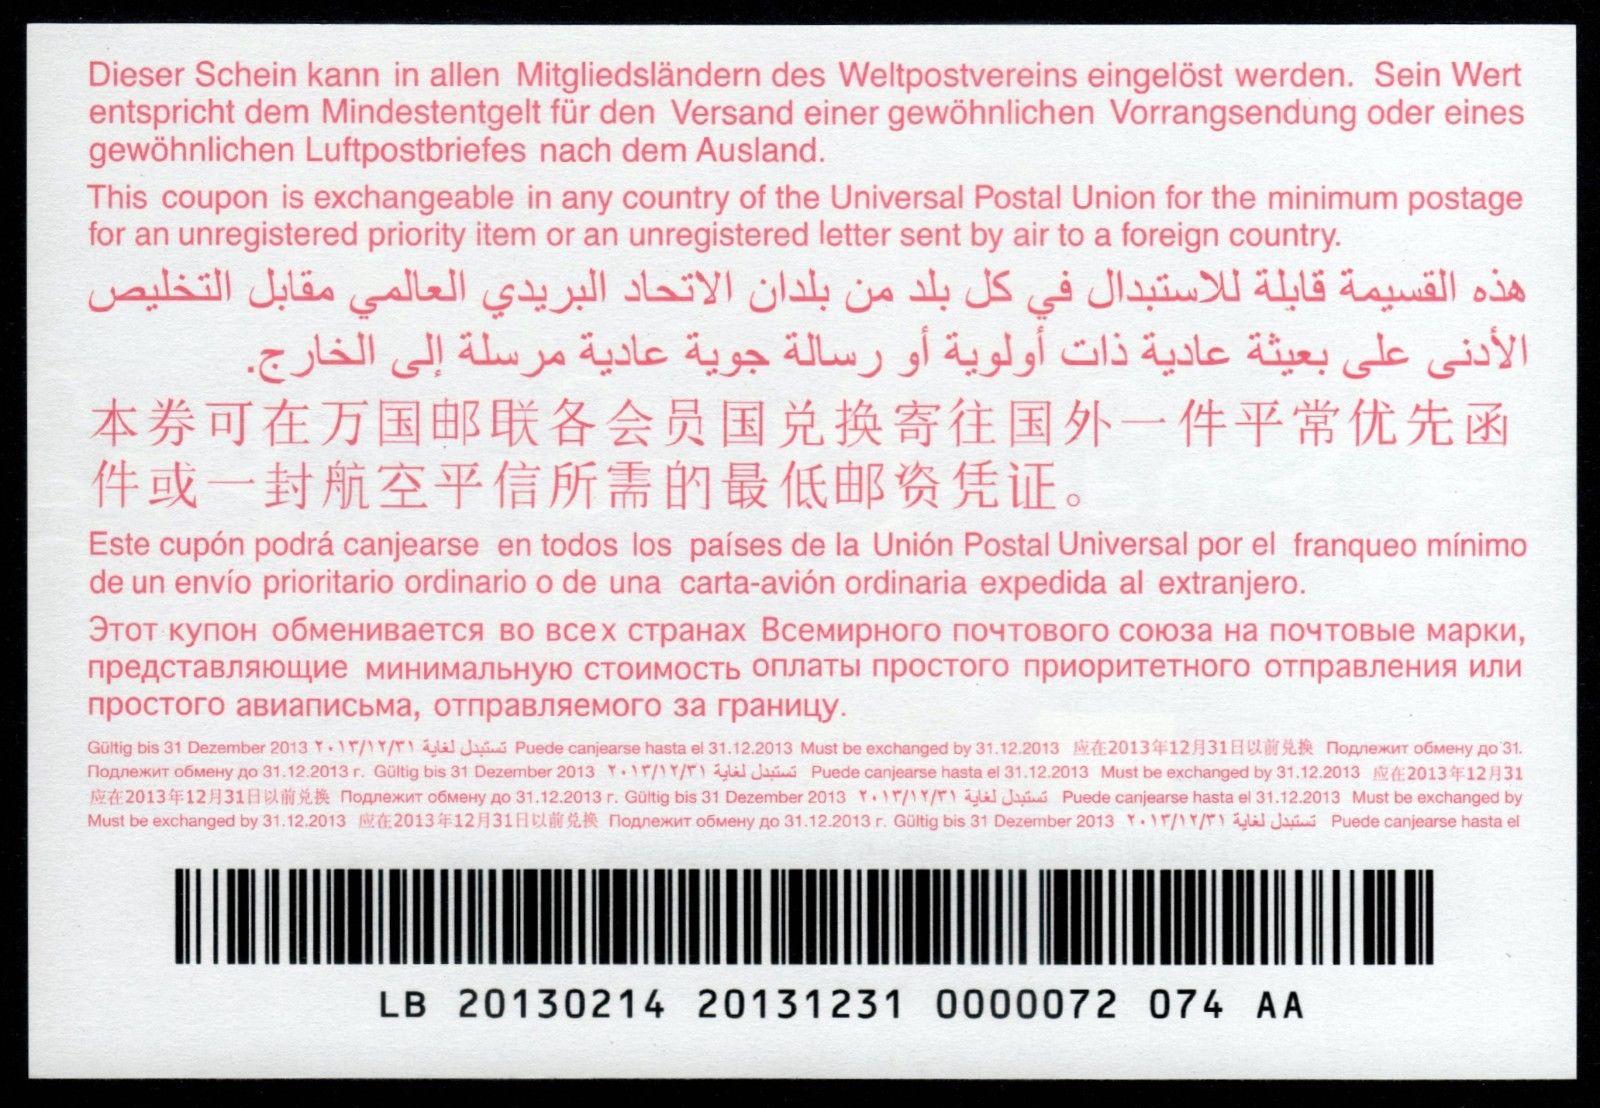 2013 IRC International Hologram Flag Reply coupon IRC UPU Back 141225217520